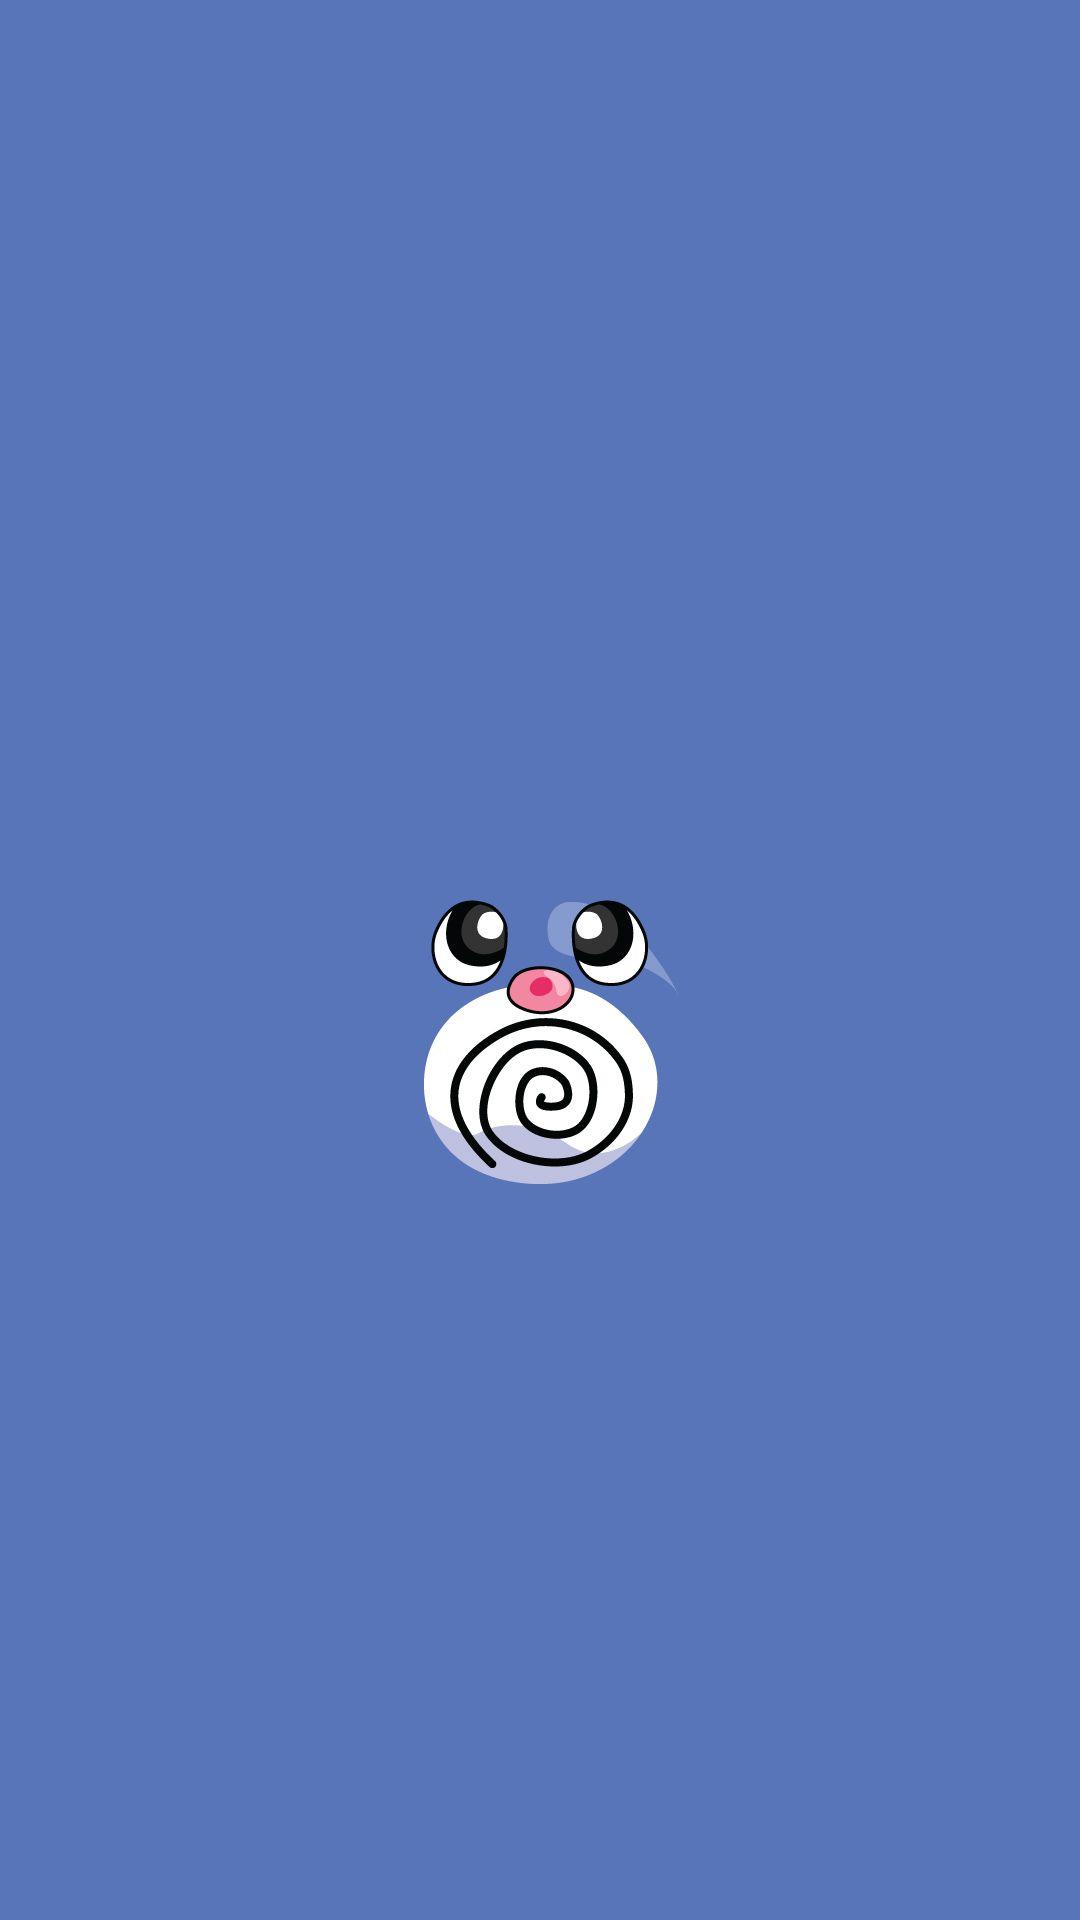 poliwag pokemon game art illustration #iphone #6 #plus #wallpaper